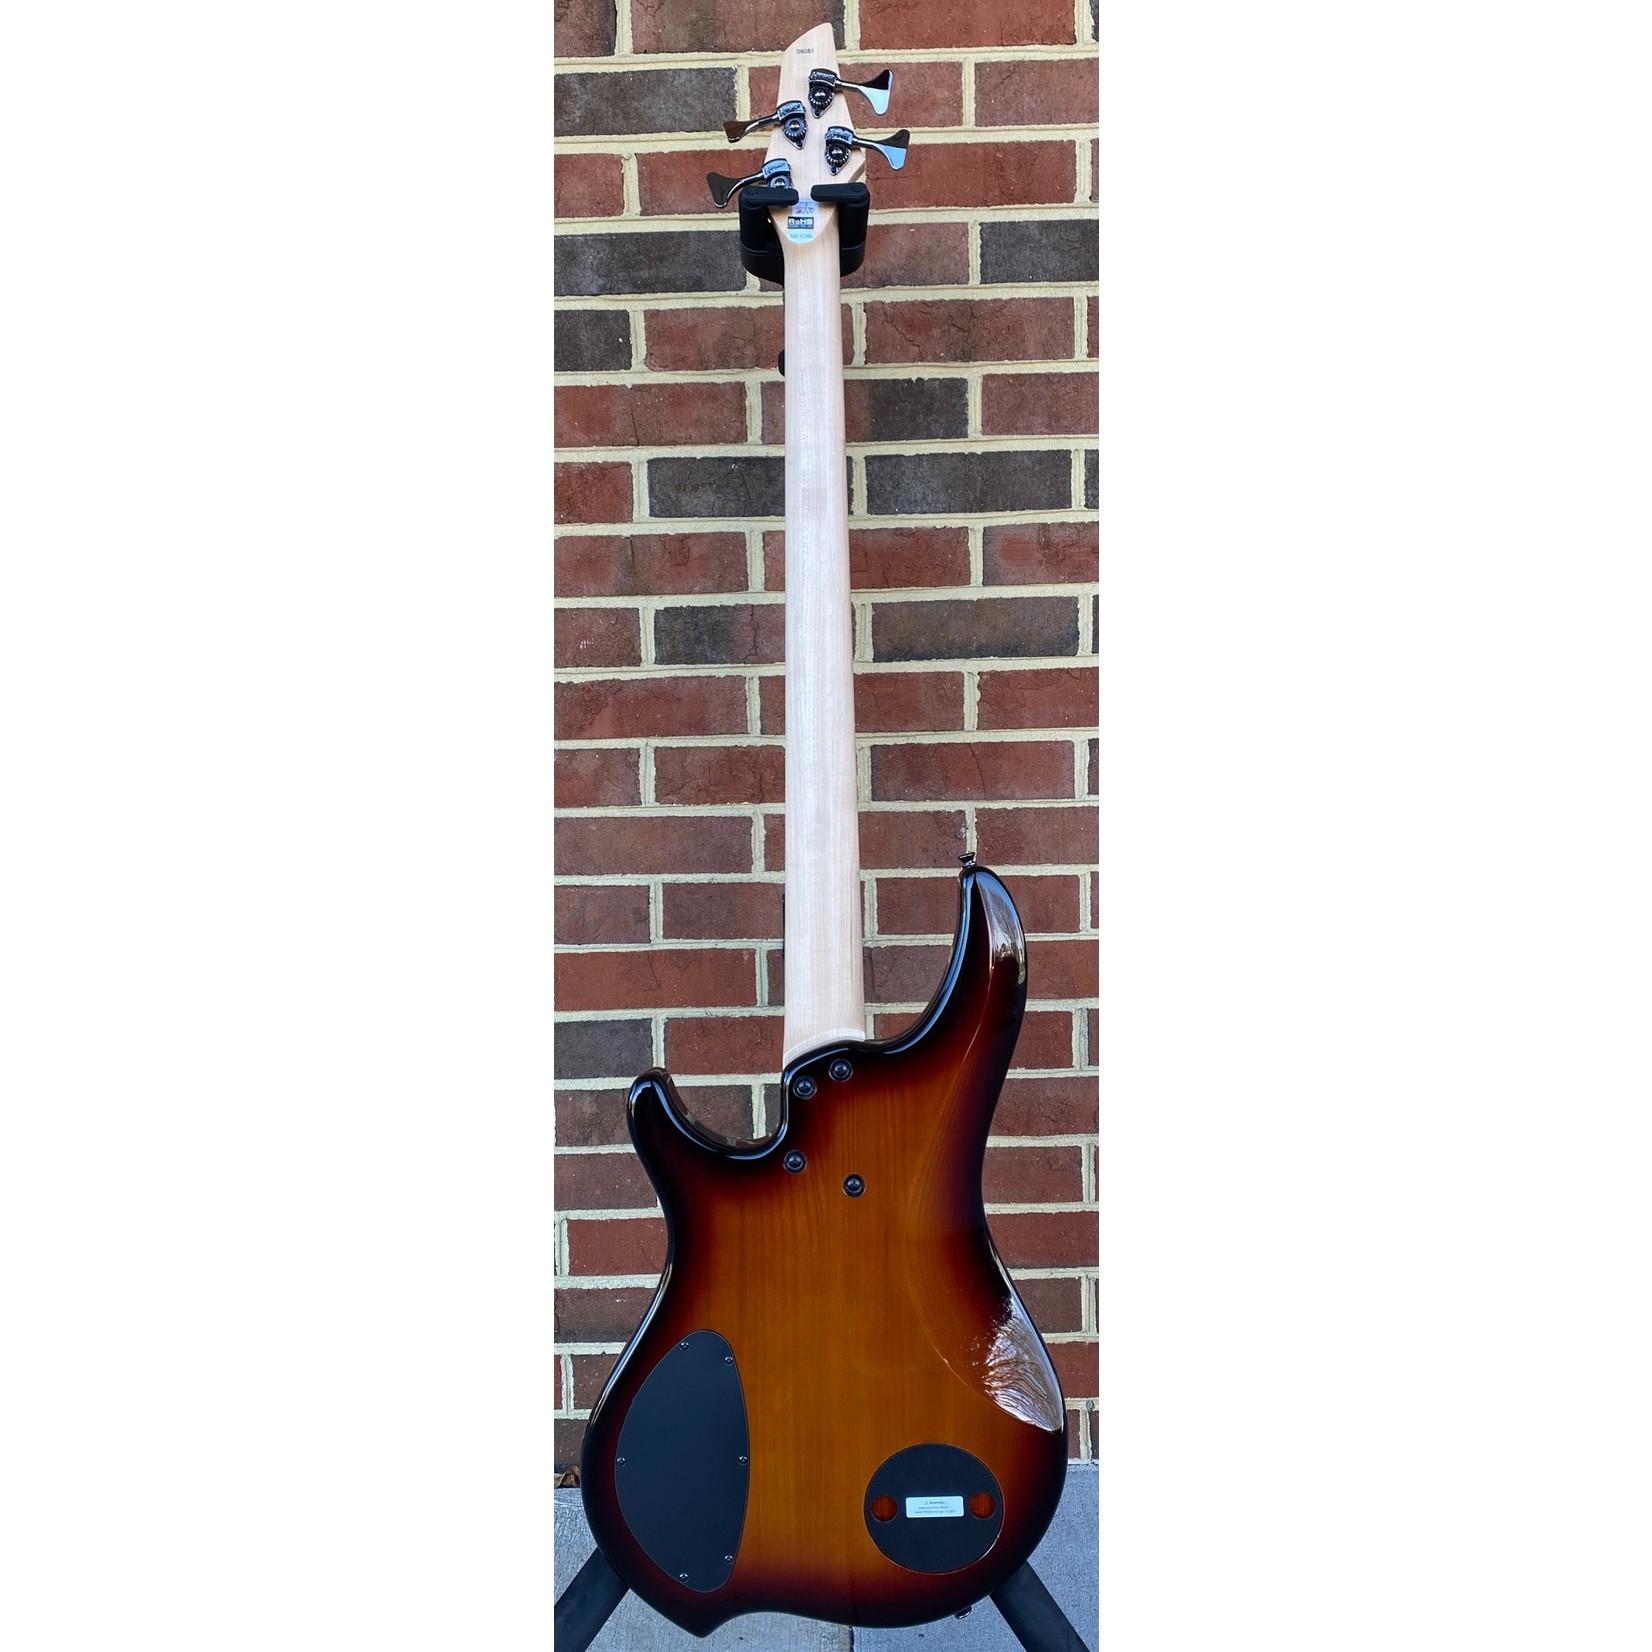 Dingwall Dingwall Combustion 4-String, 3x Pickups, Vintageburst, Quilted Maple Top, Pau Ferro Fretboard, Dingwall Gig Bag, SN# 8081